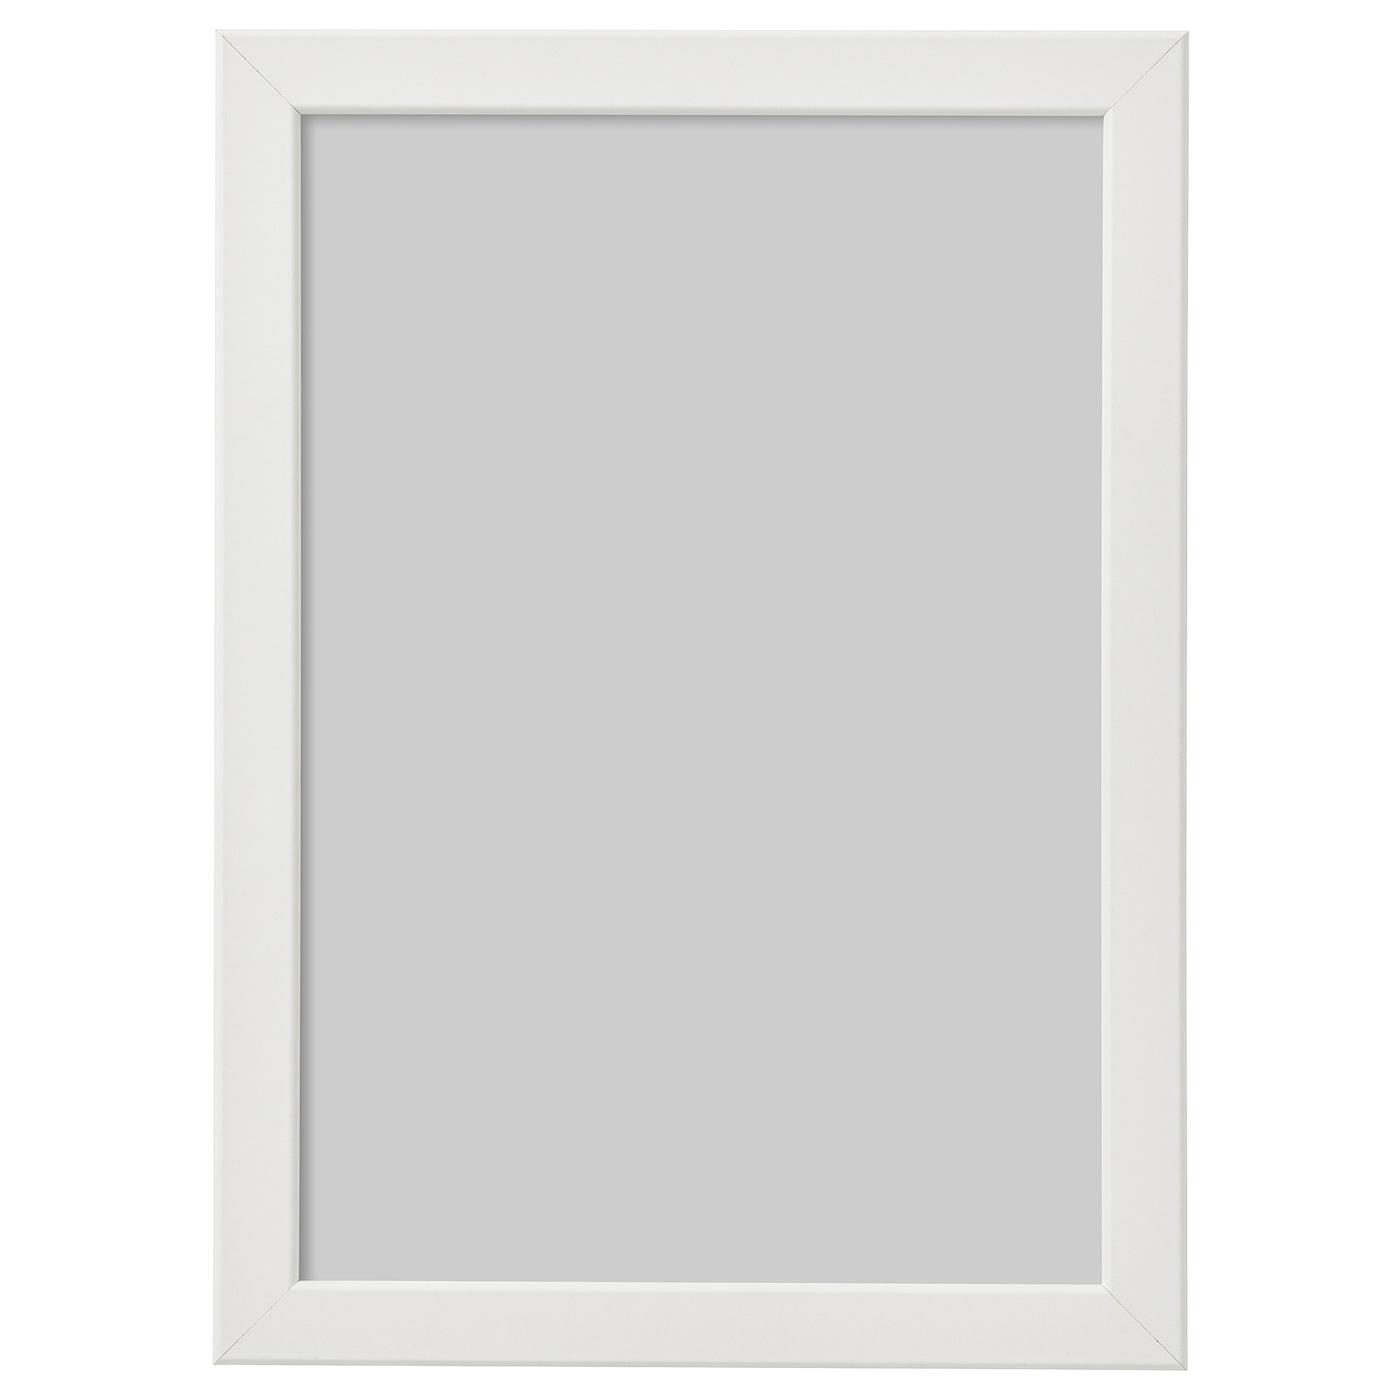 Photo Frames & Multi Picture Frames | IKEA